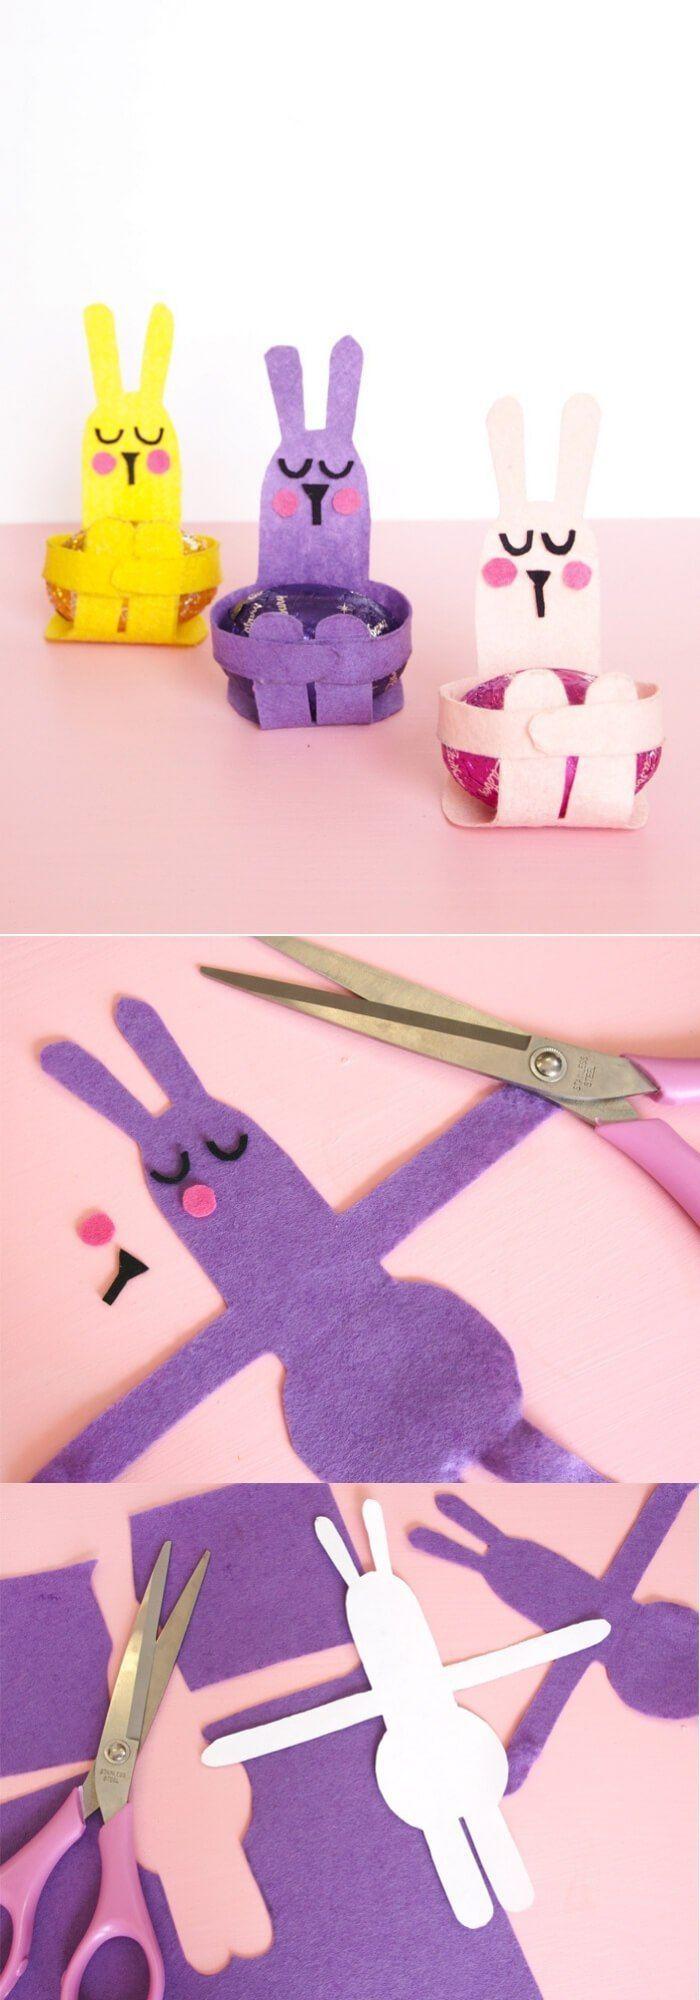 15+ Fun & Easy Easter Crafts für Kinder – FarmFoodFamily